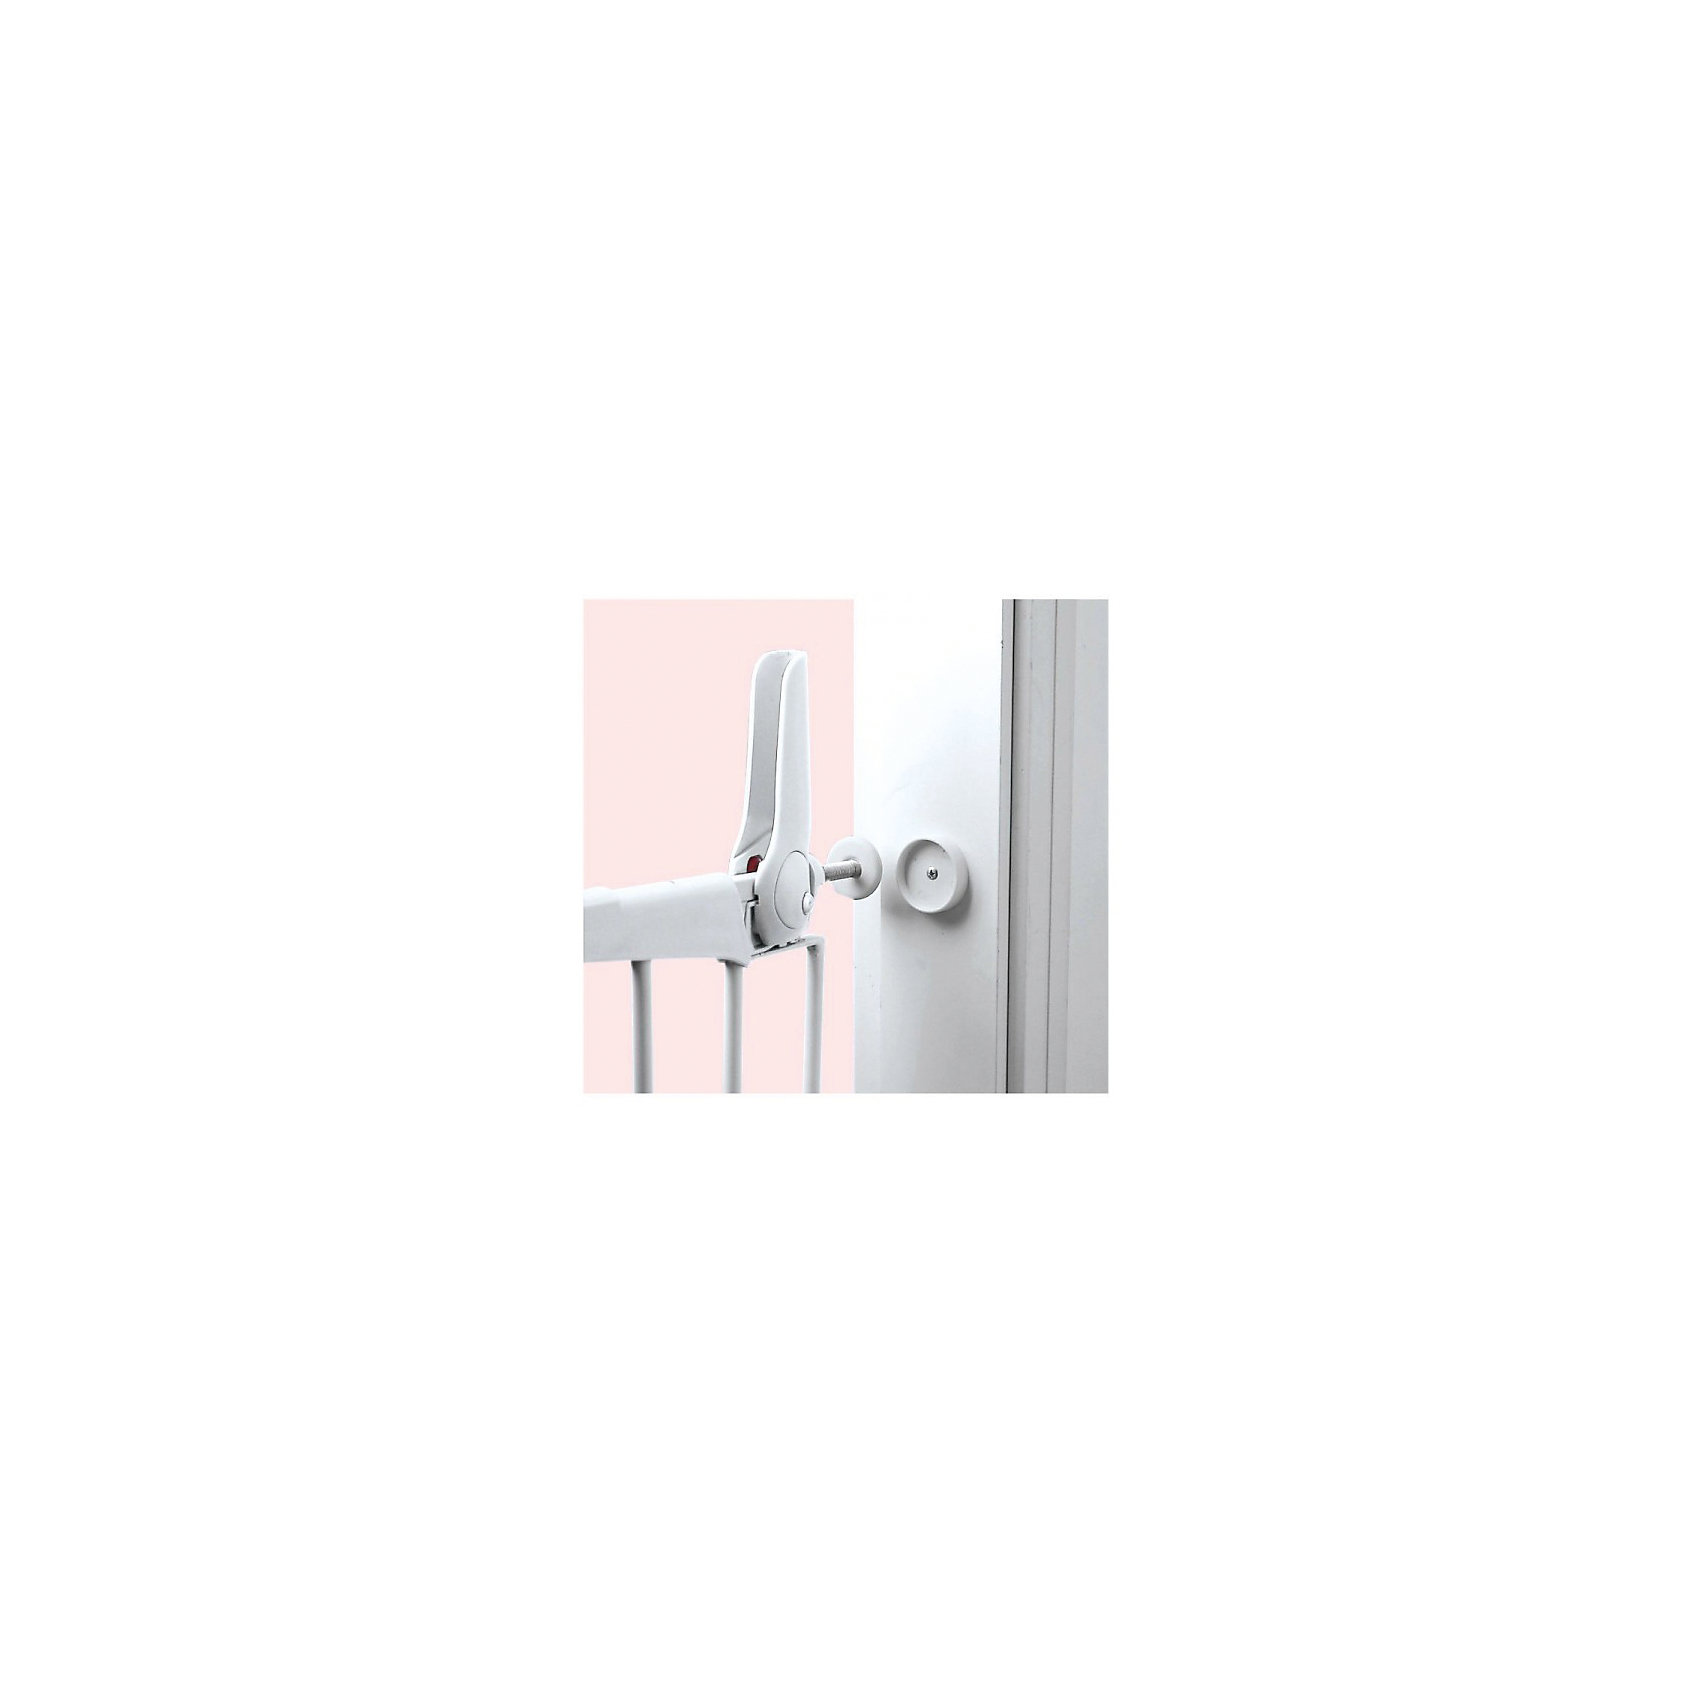 Барьер для двери Securella 750*790, Brevi